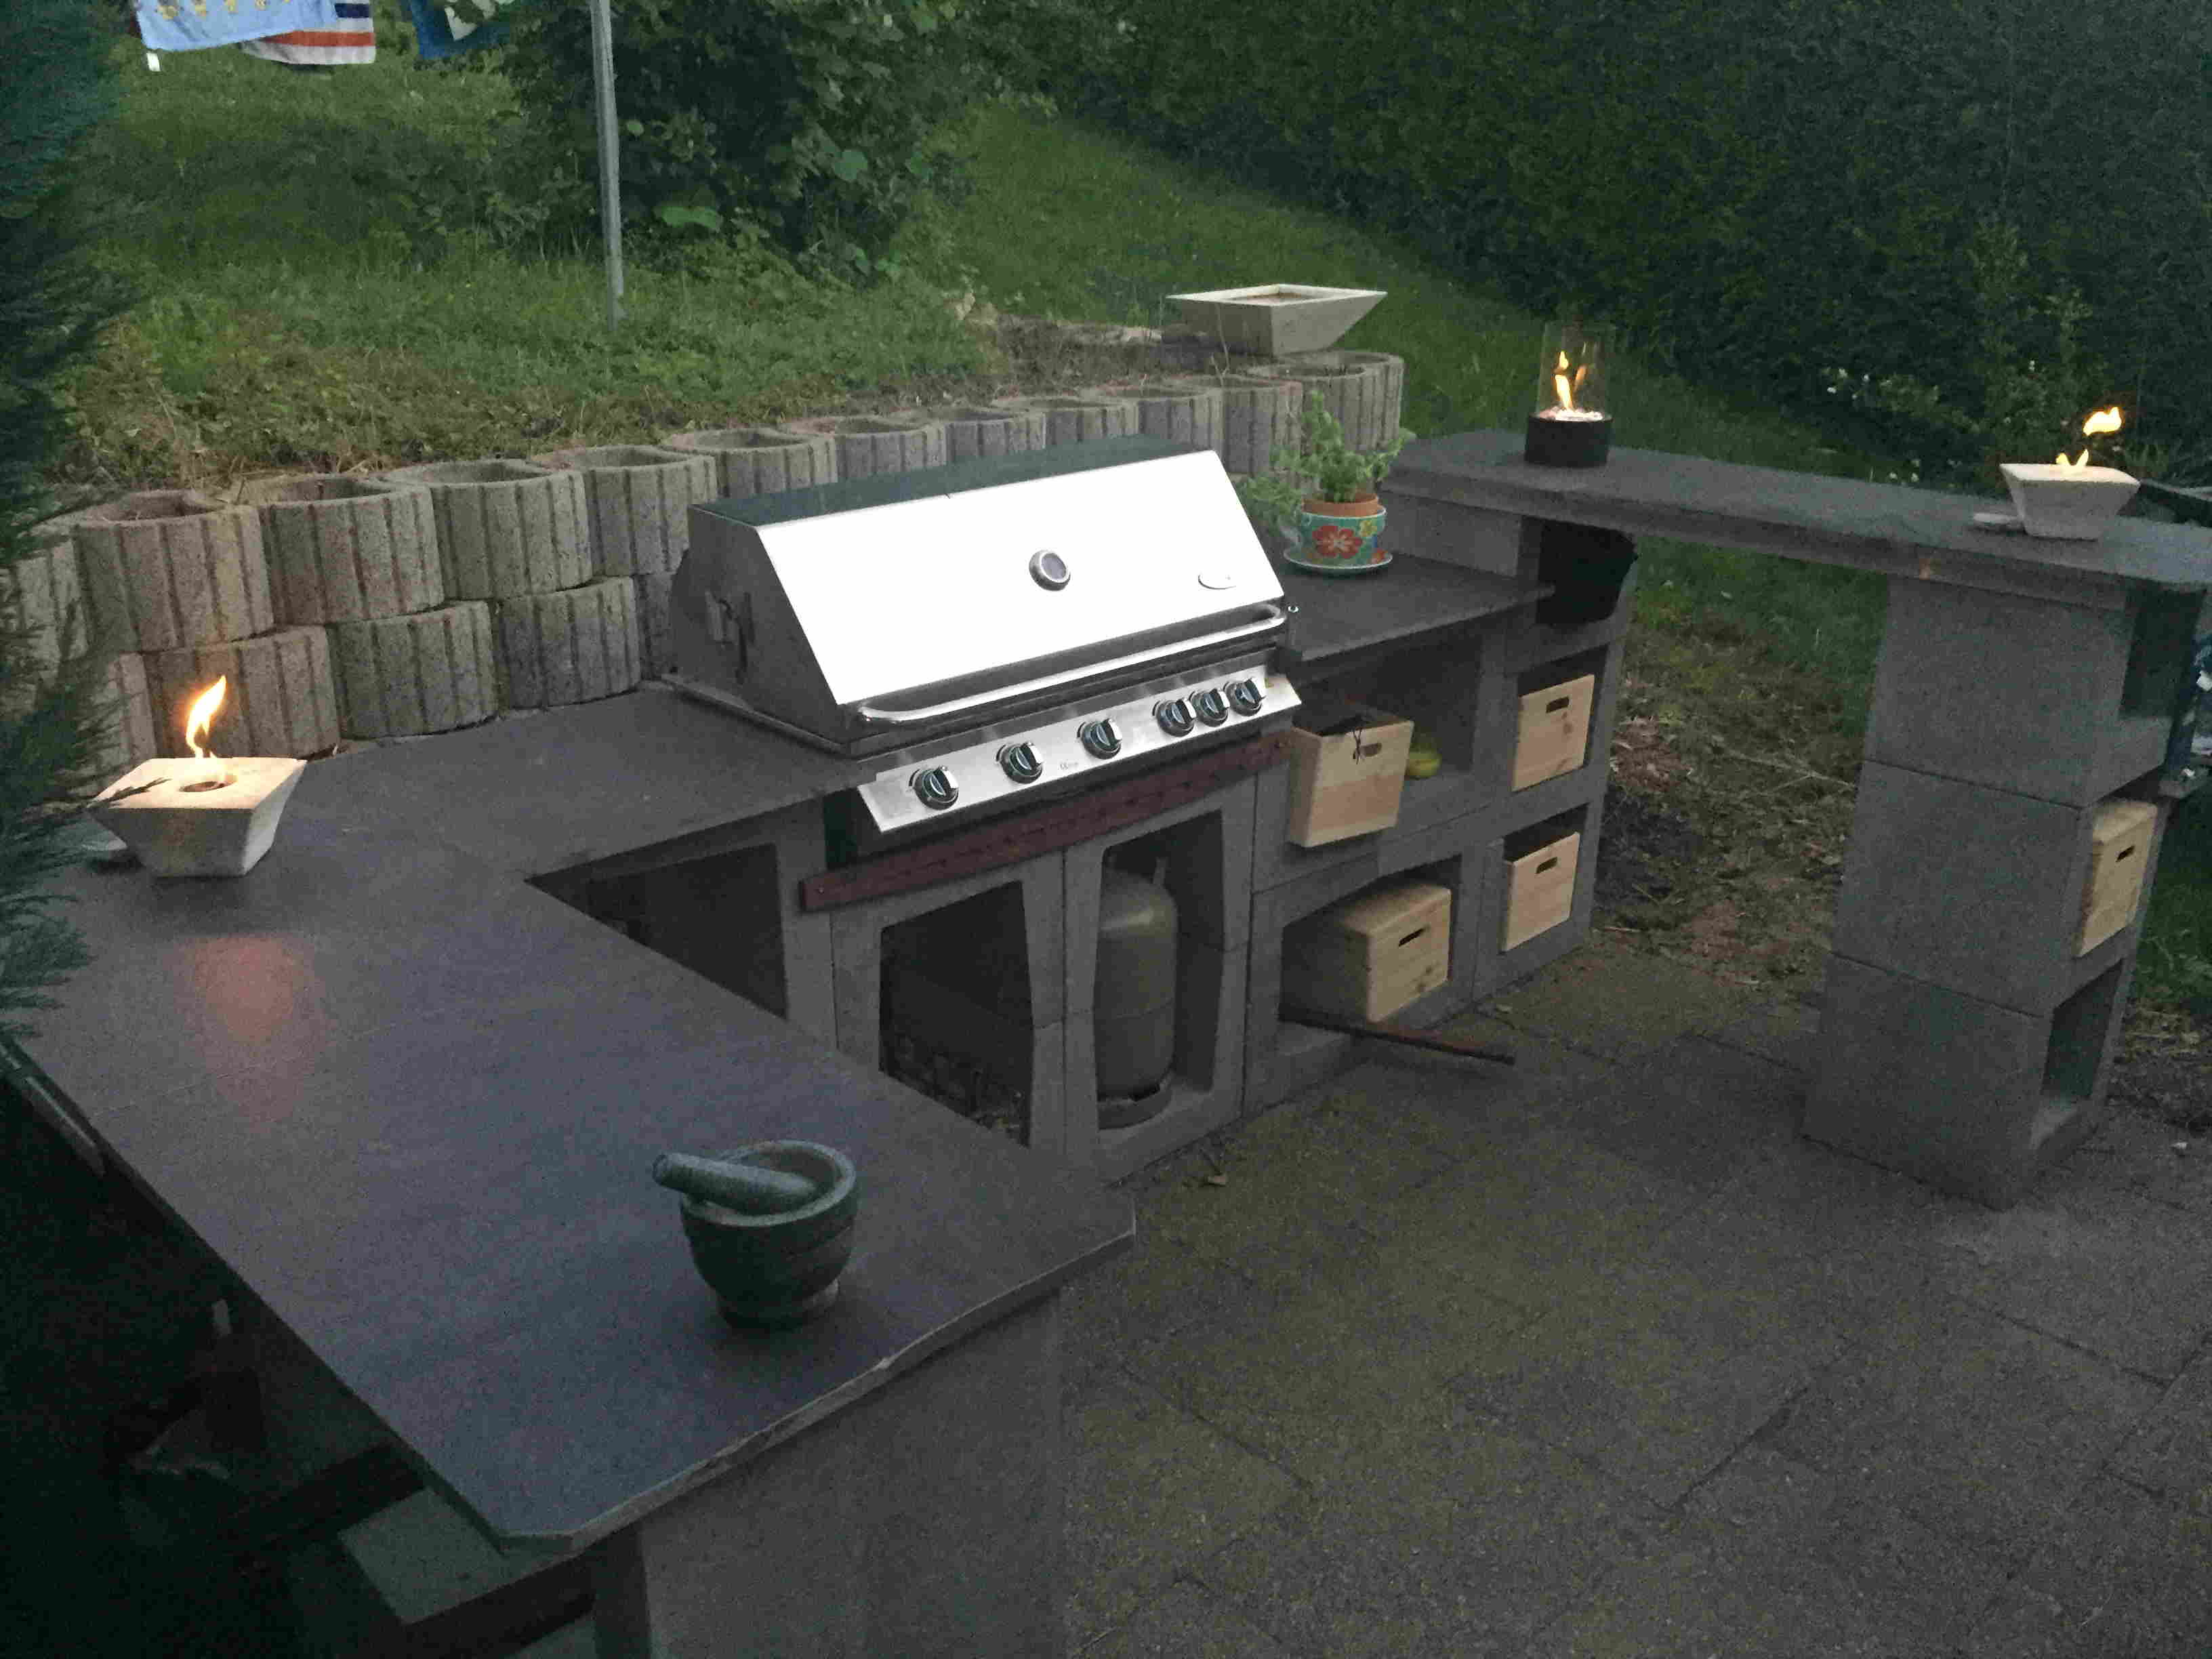 Outdoorküche Weber Birokrasi : Weber outdoorküche outdoorküche in italien mit weber grill und